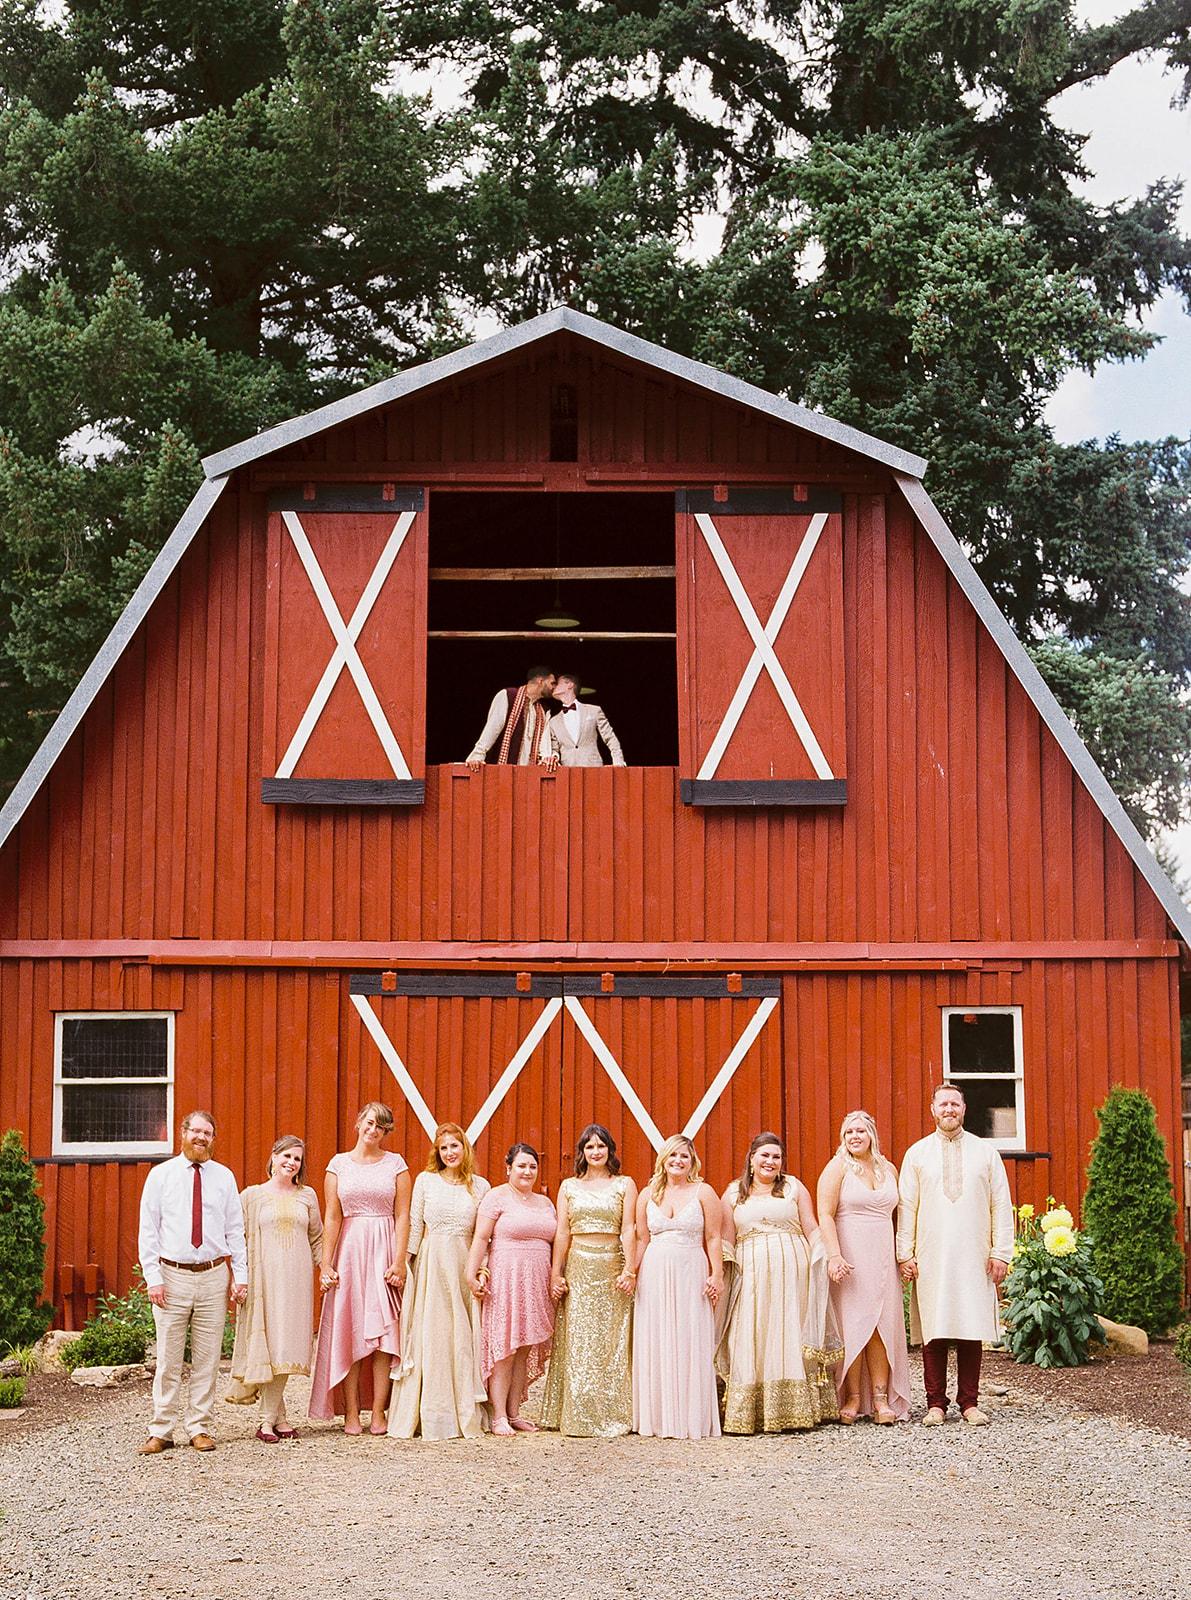 justin kevin wedding party at barn venue